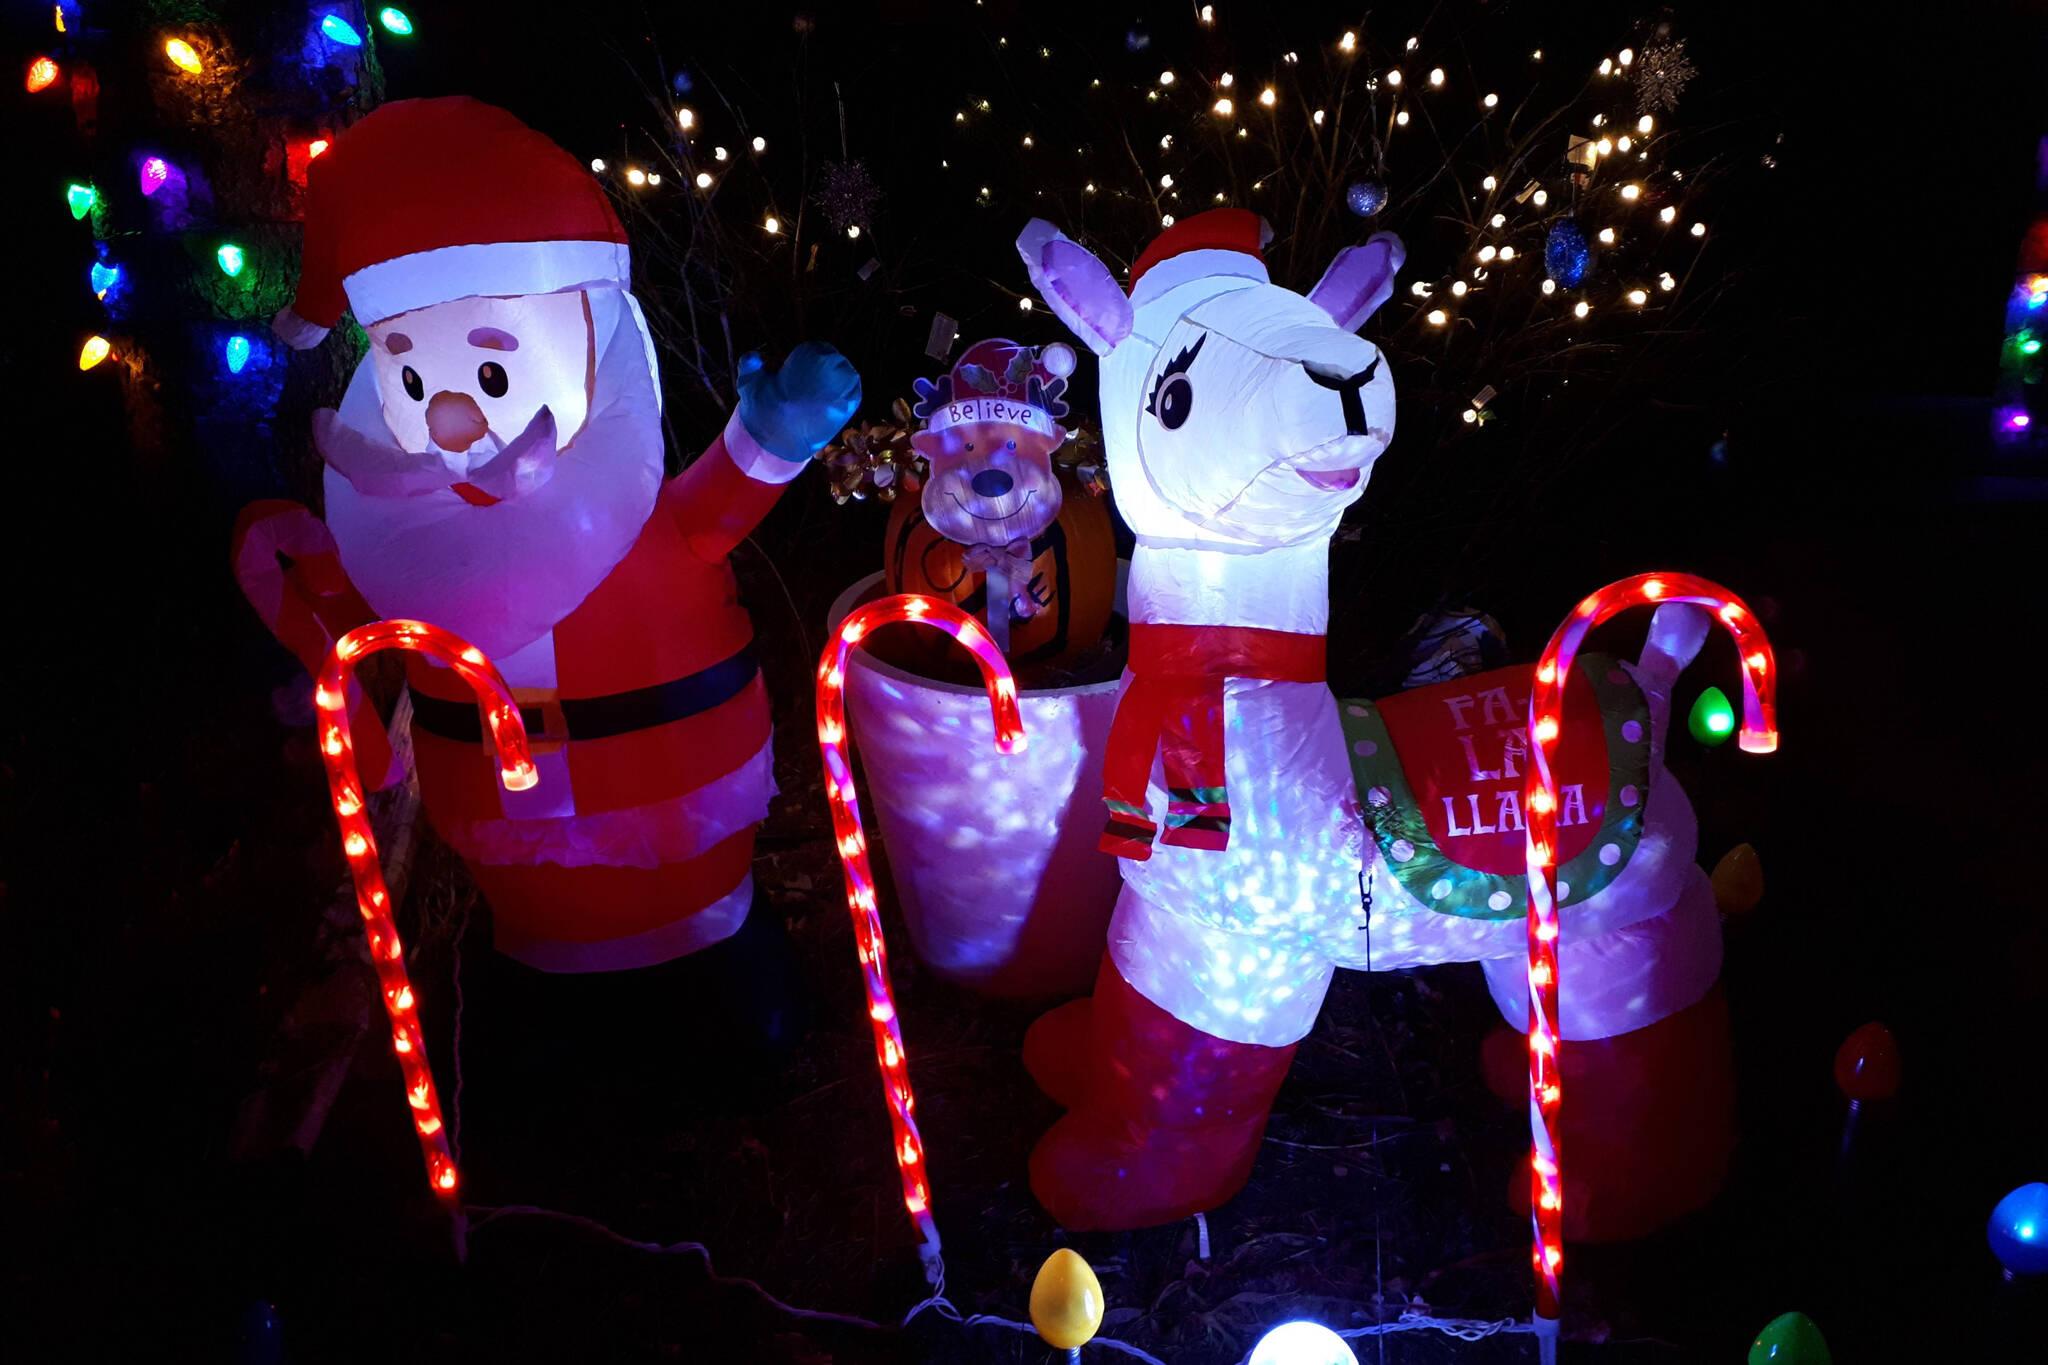 llama lights